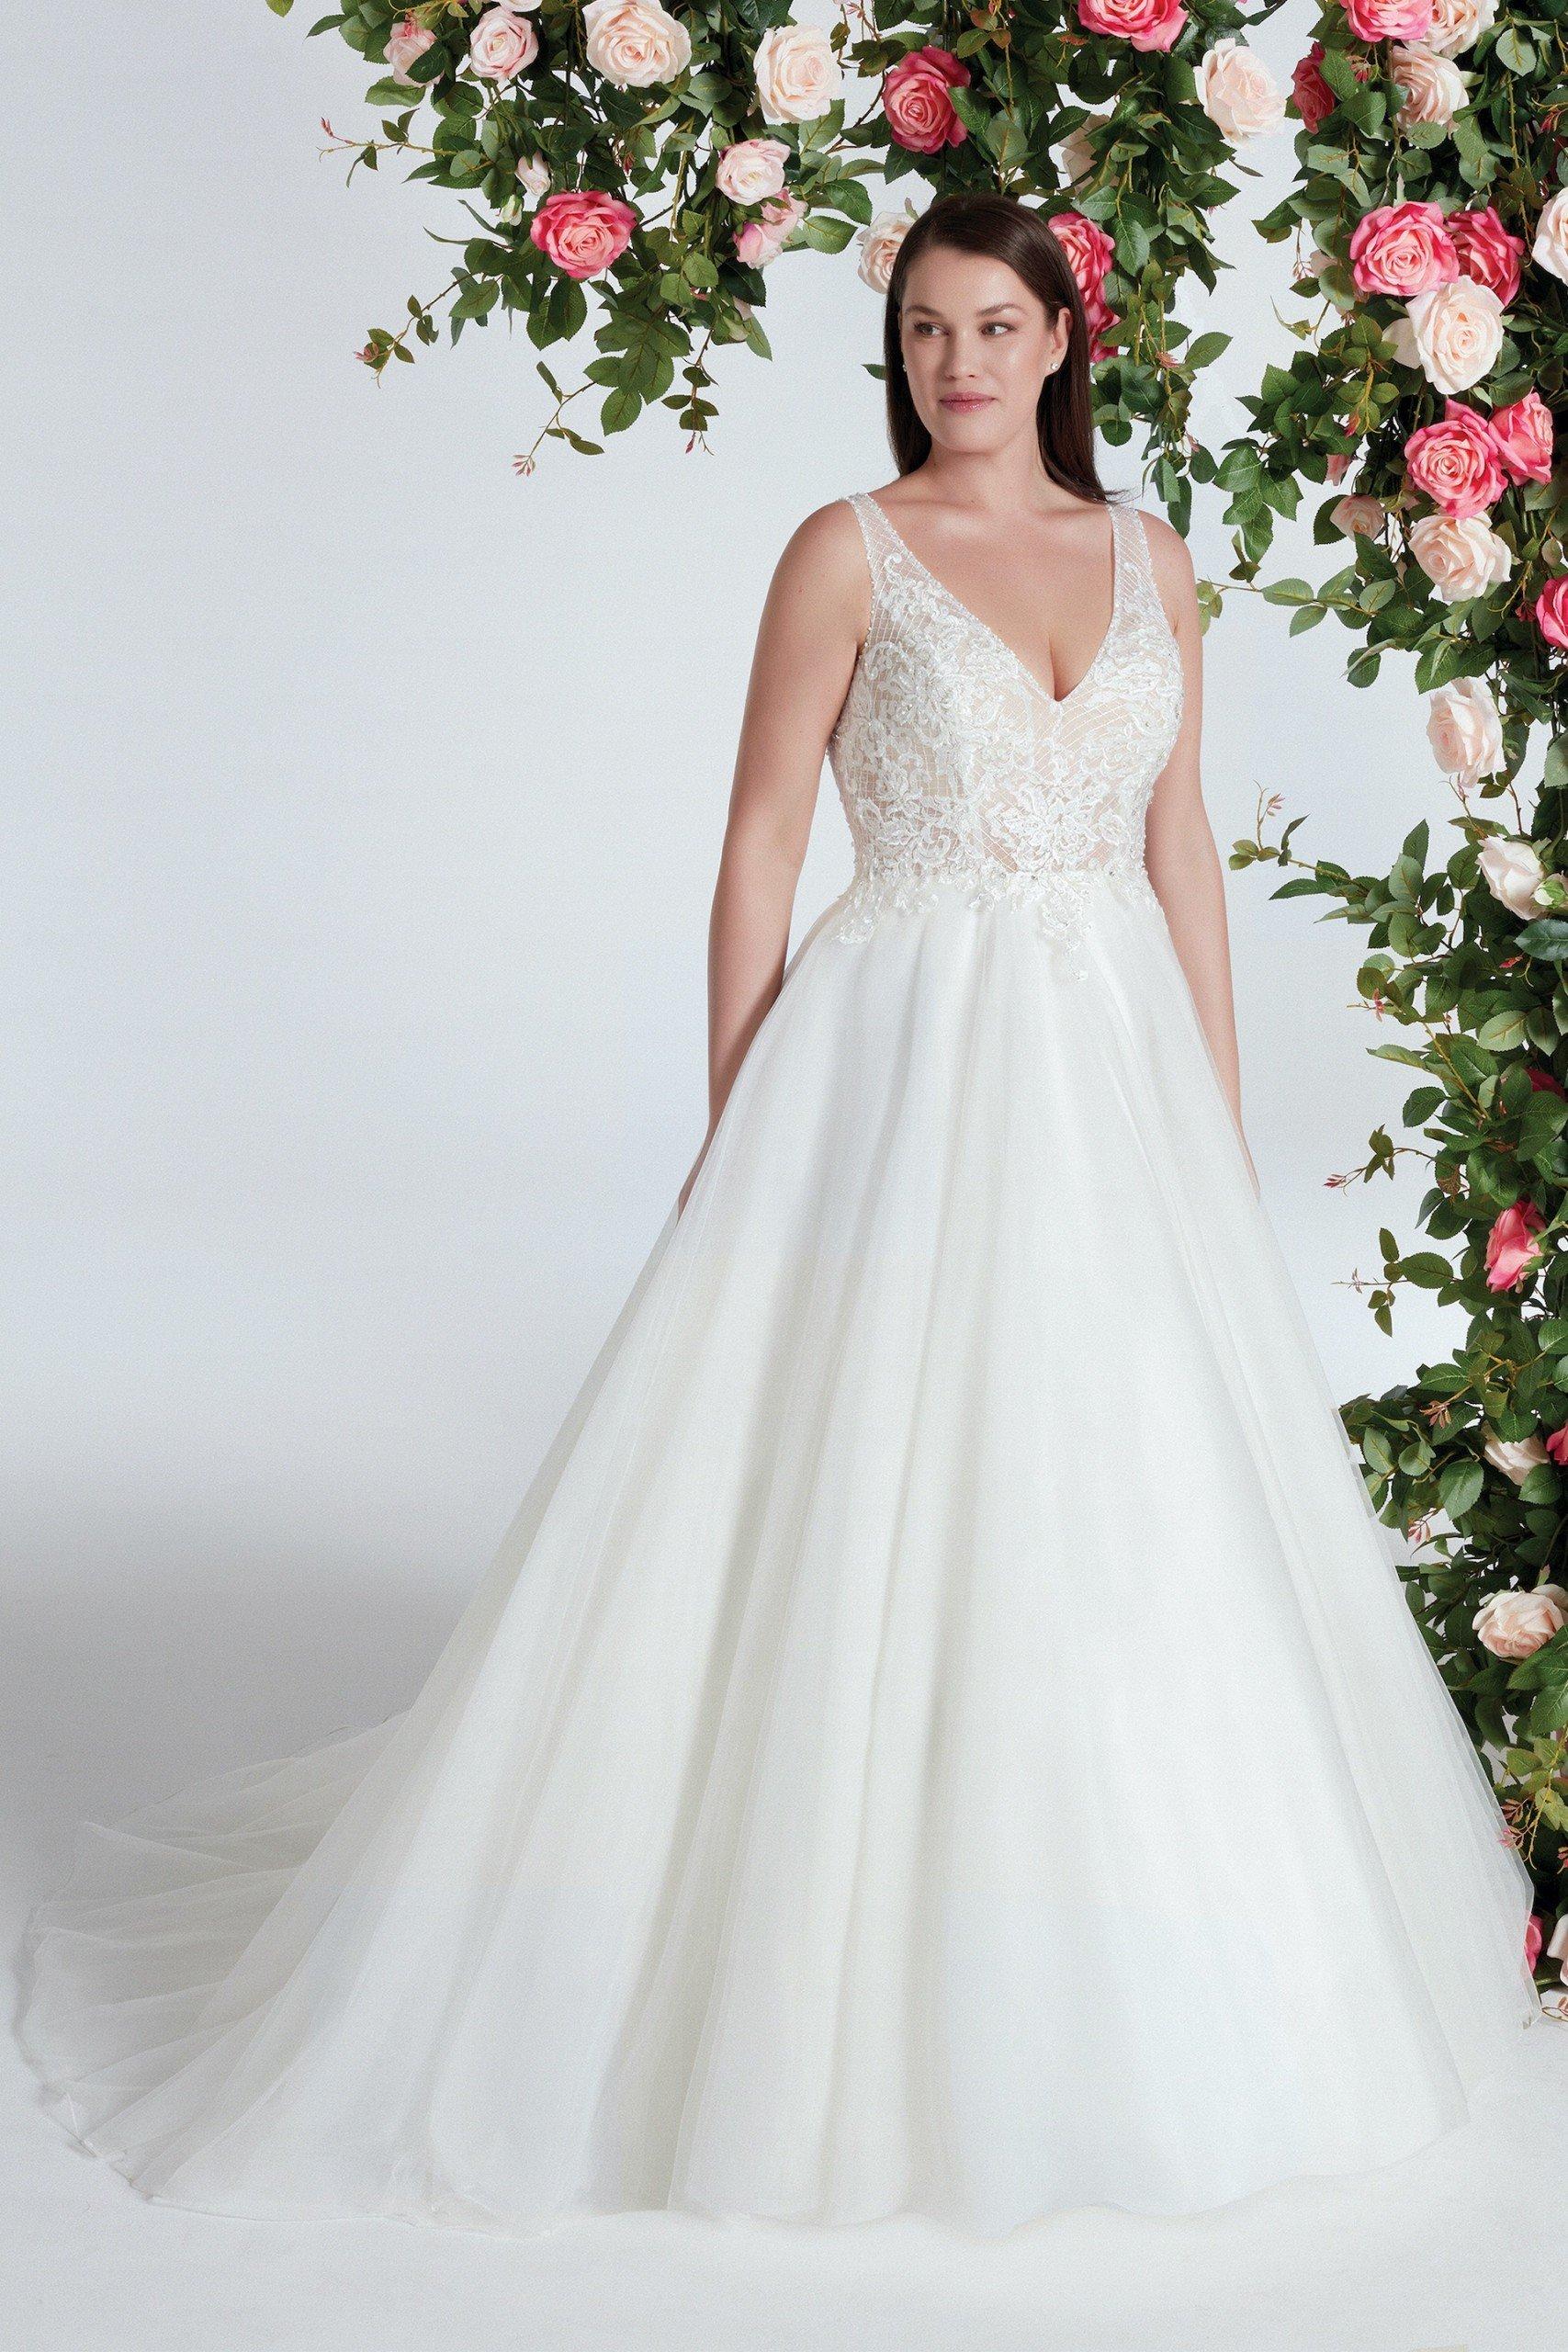 Brautkleid im Prinzessstil mit Tüllrock, transparentem